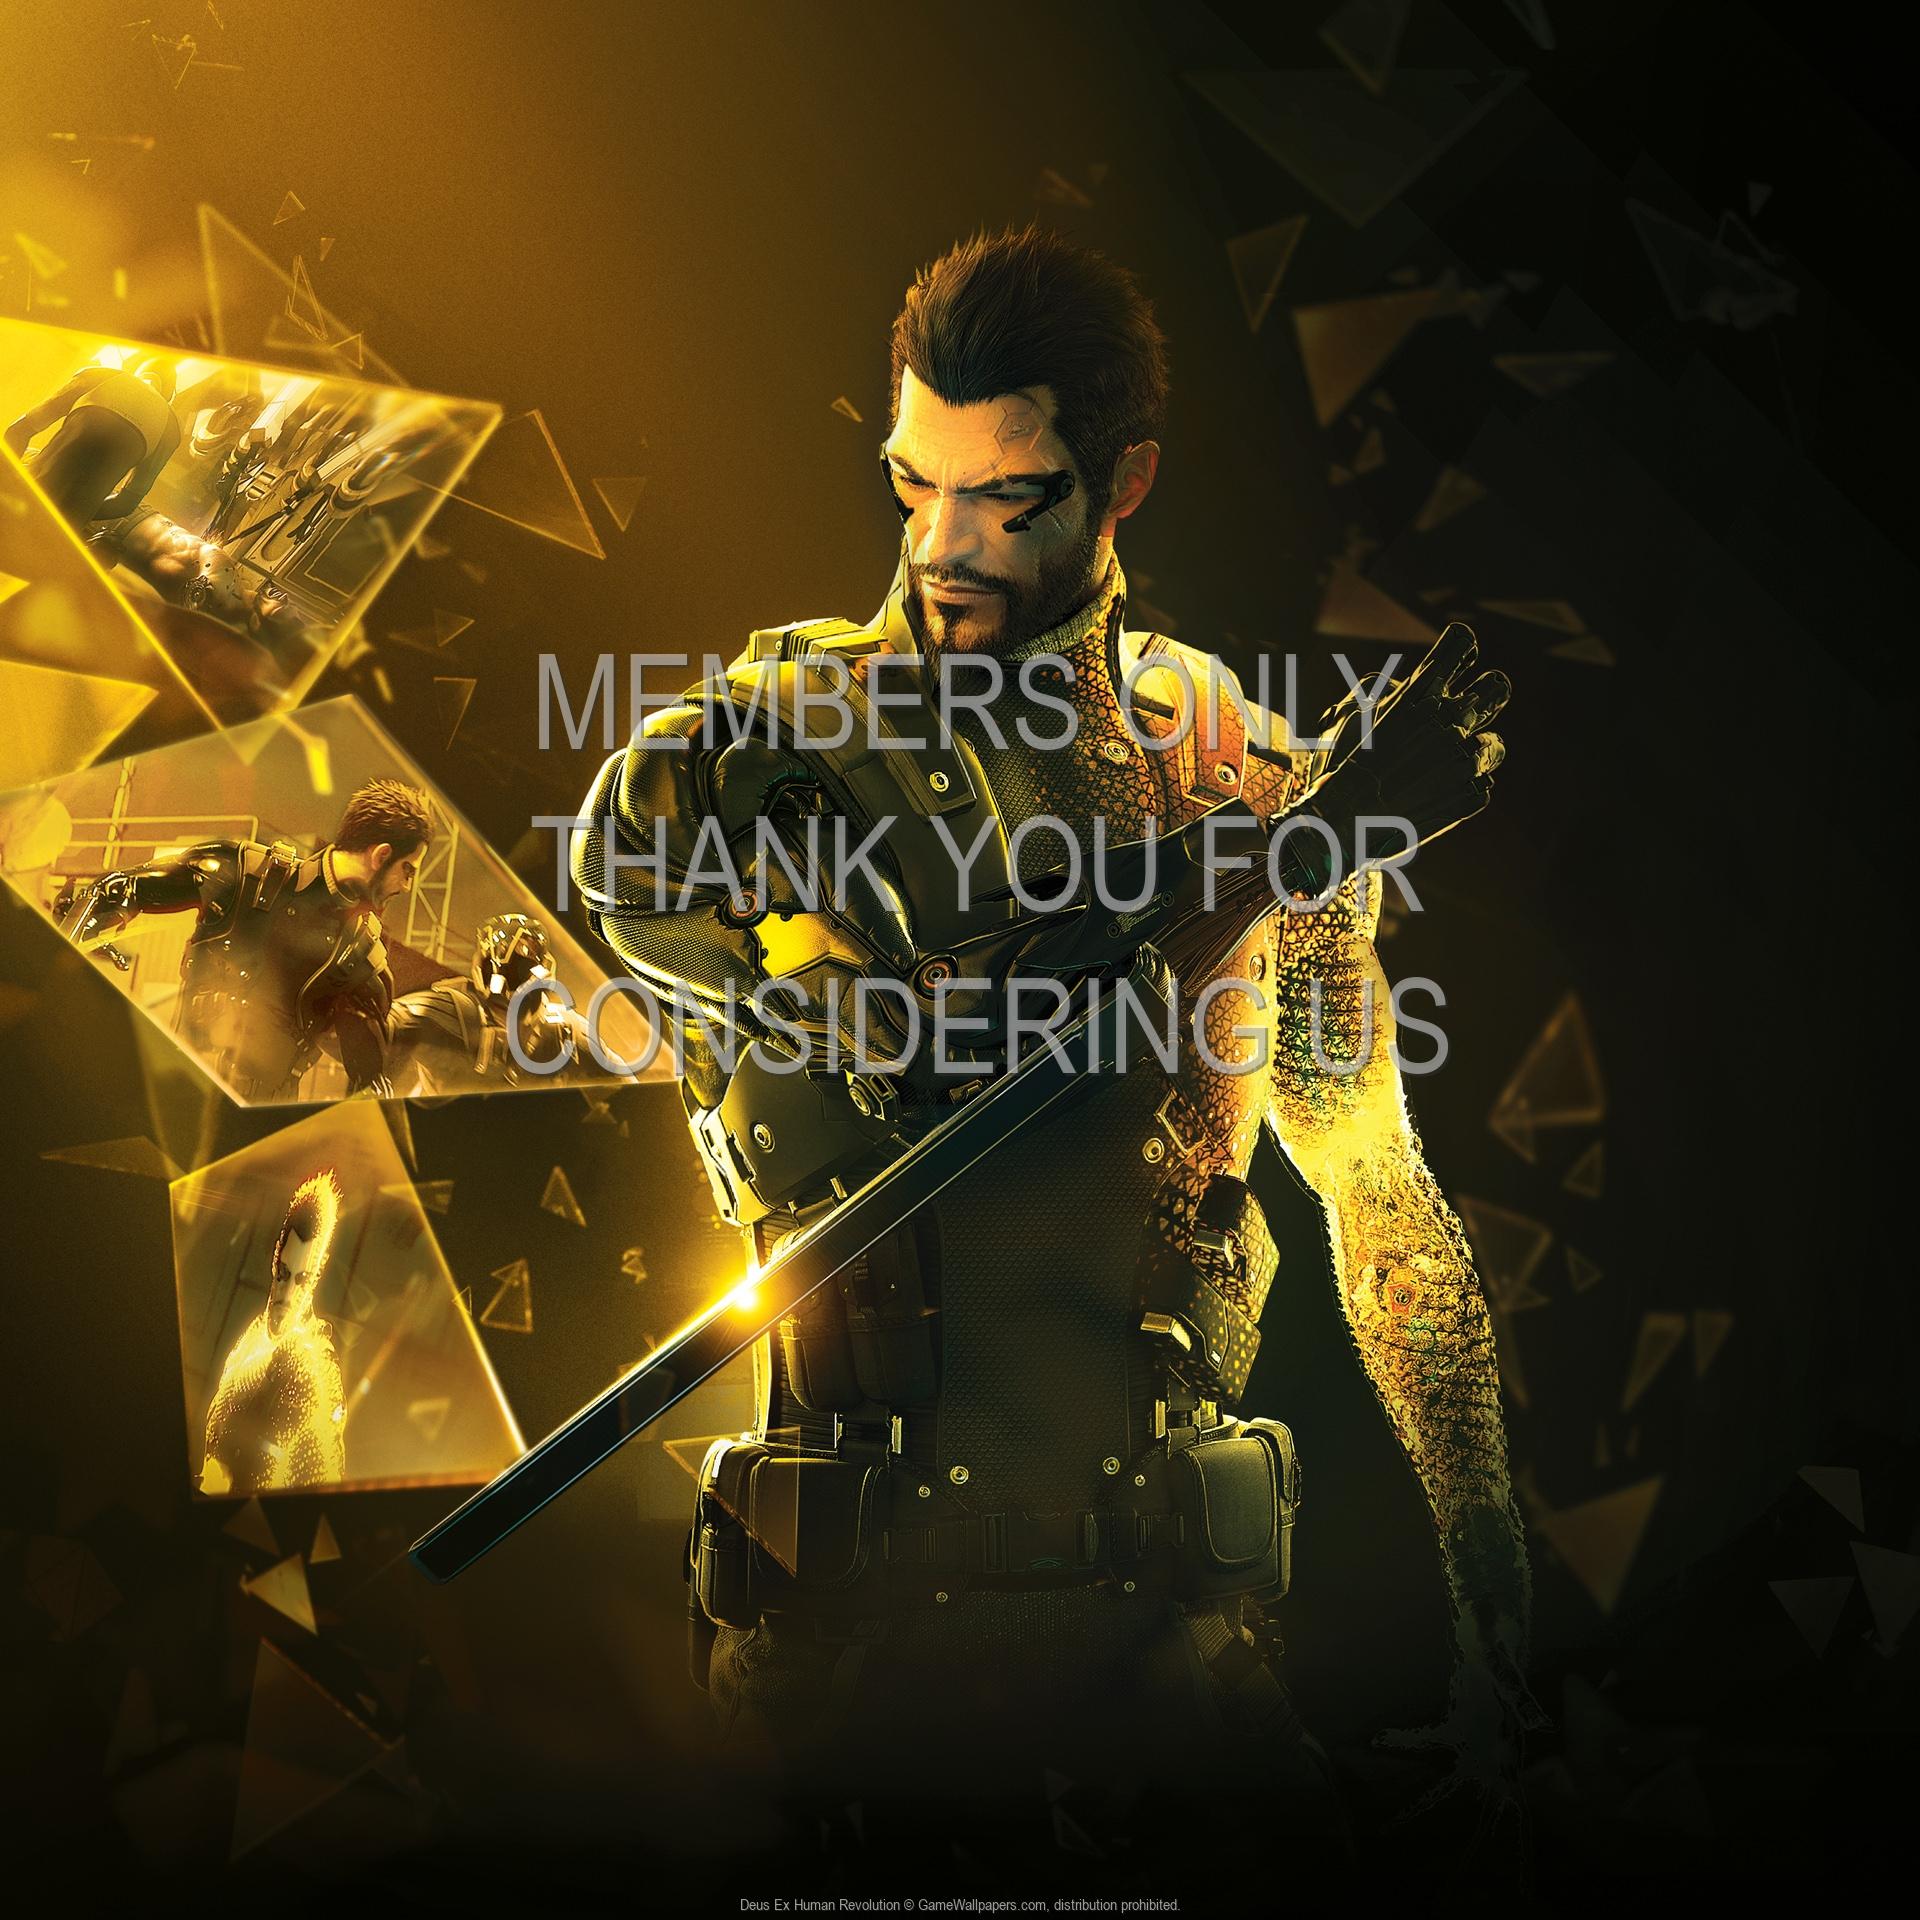 Deus Ex: Human Revolution 1920x1080 Handy Hintergrundbild 18